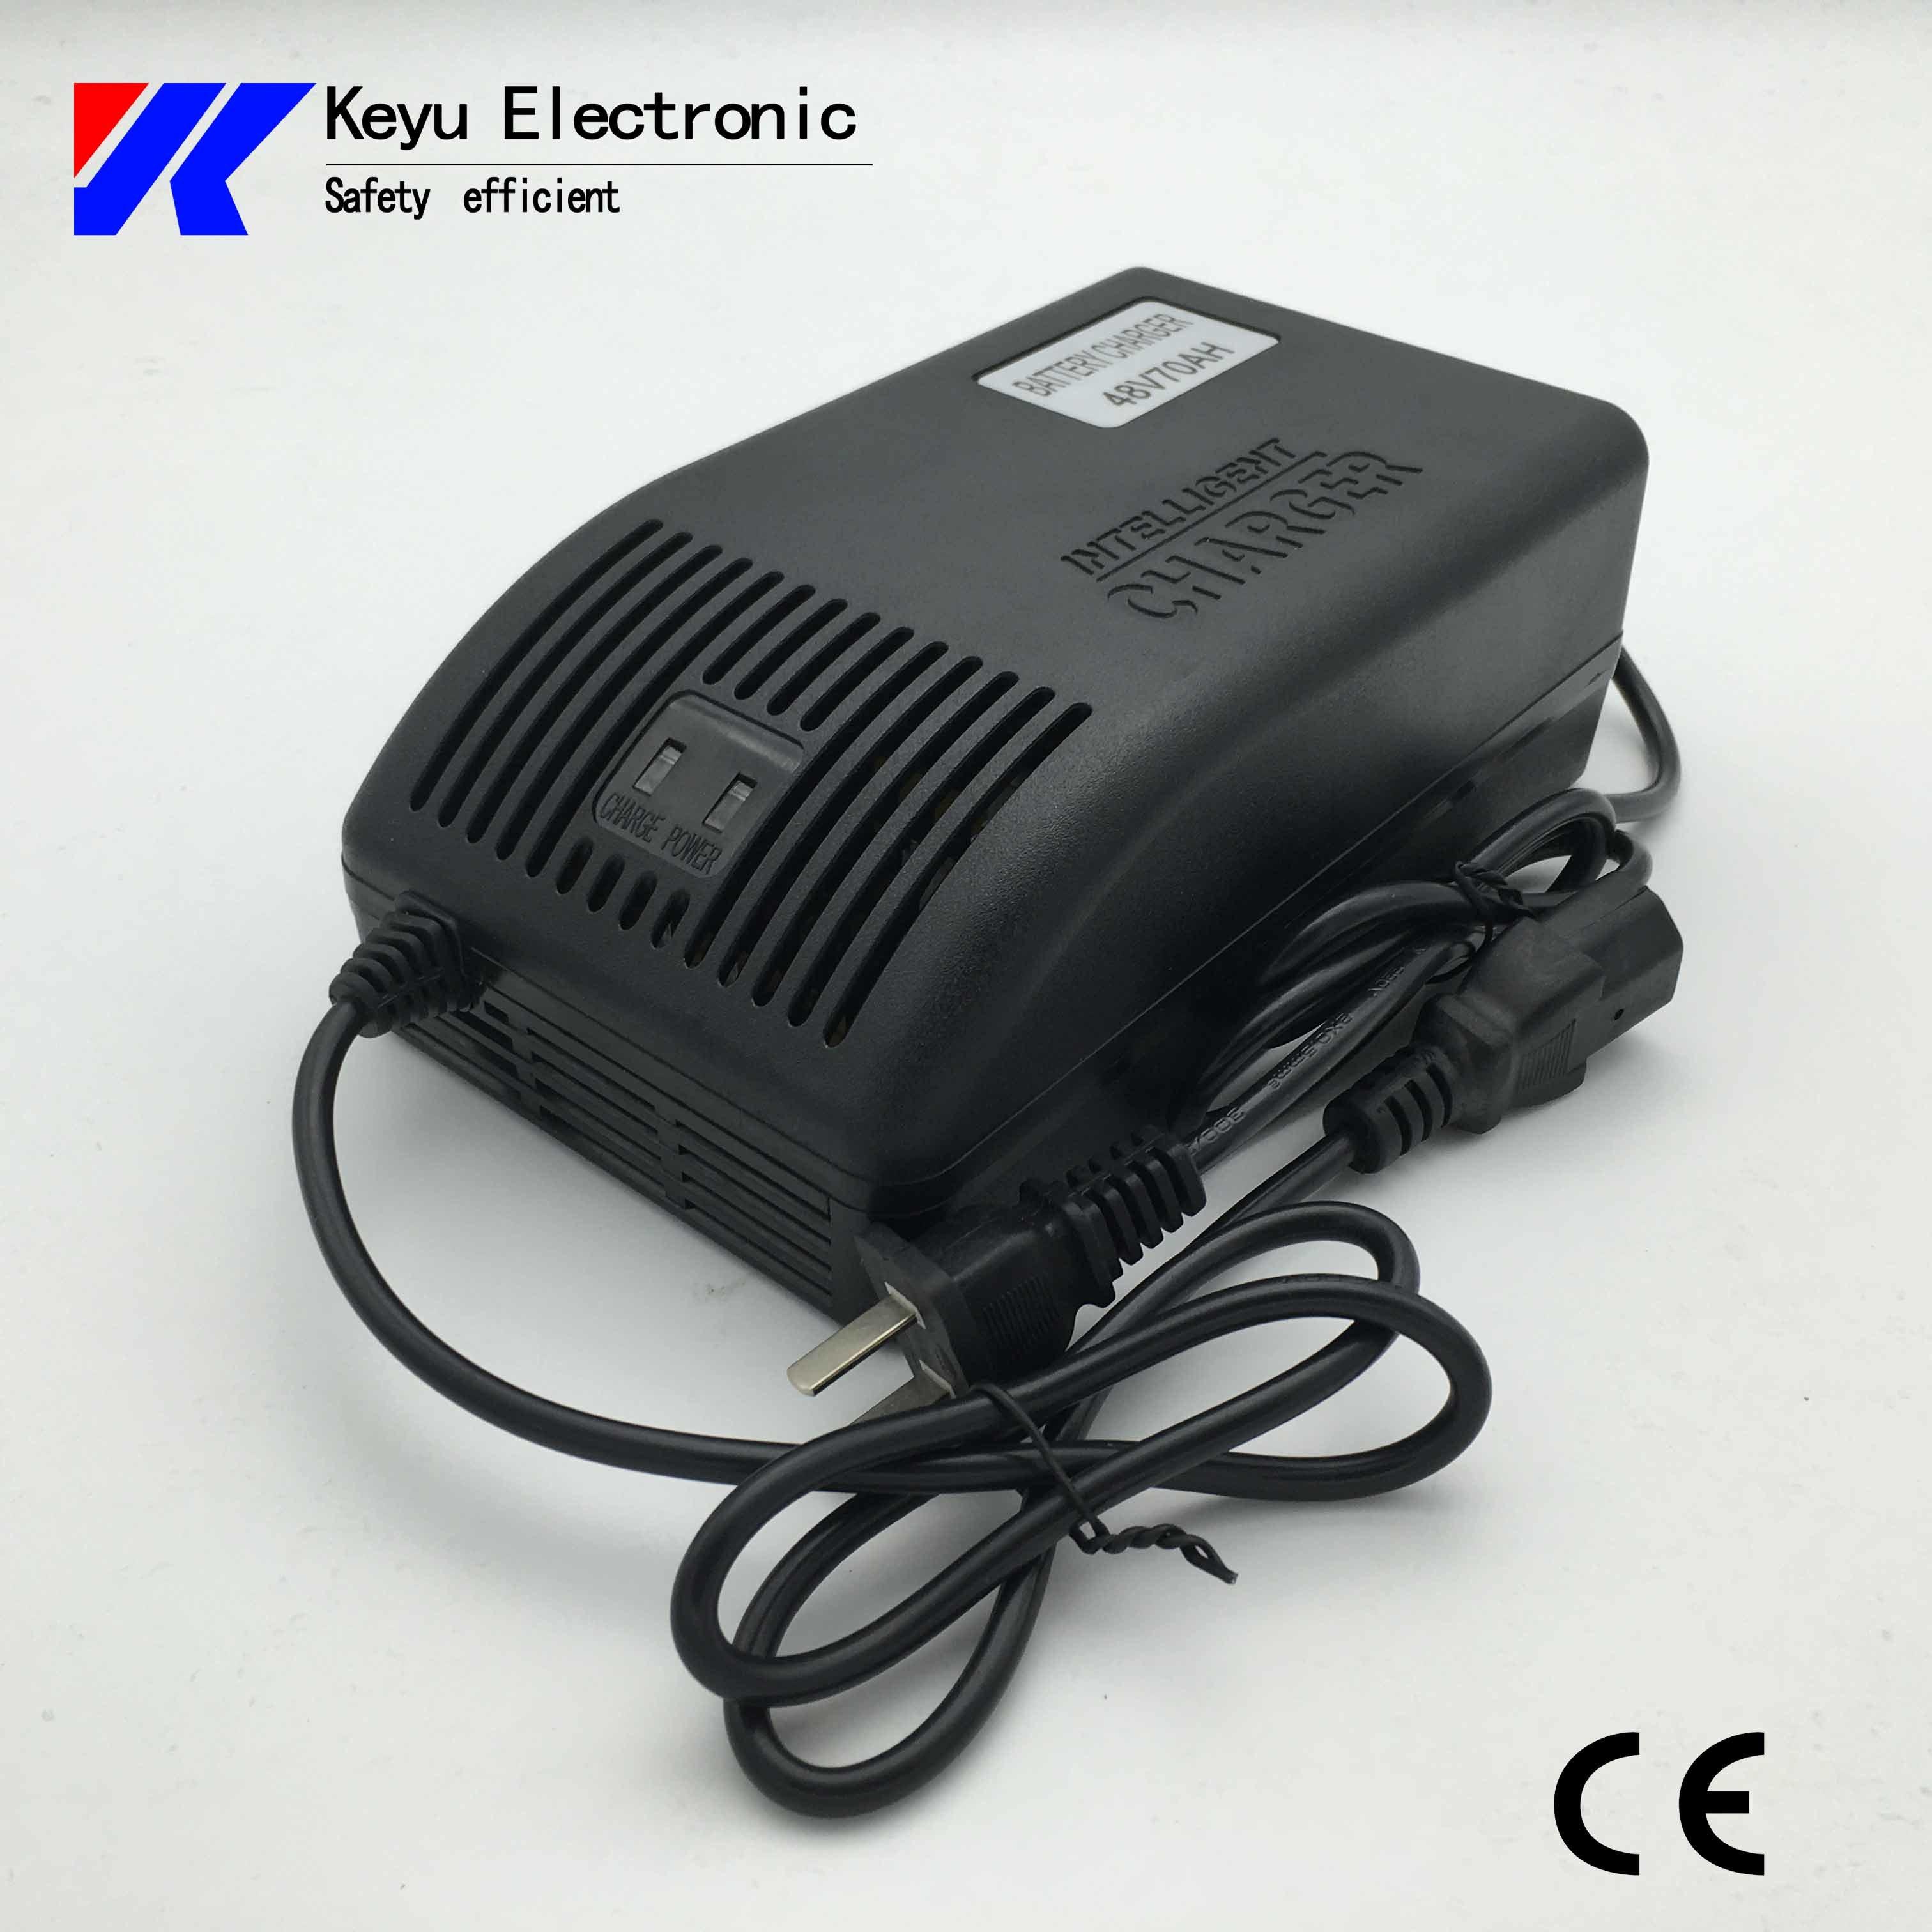 Ke Yu Ebike Charger (Lead Acid battery) 48V-40ah